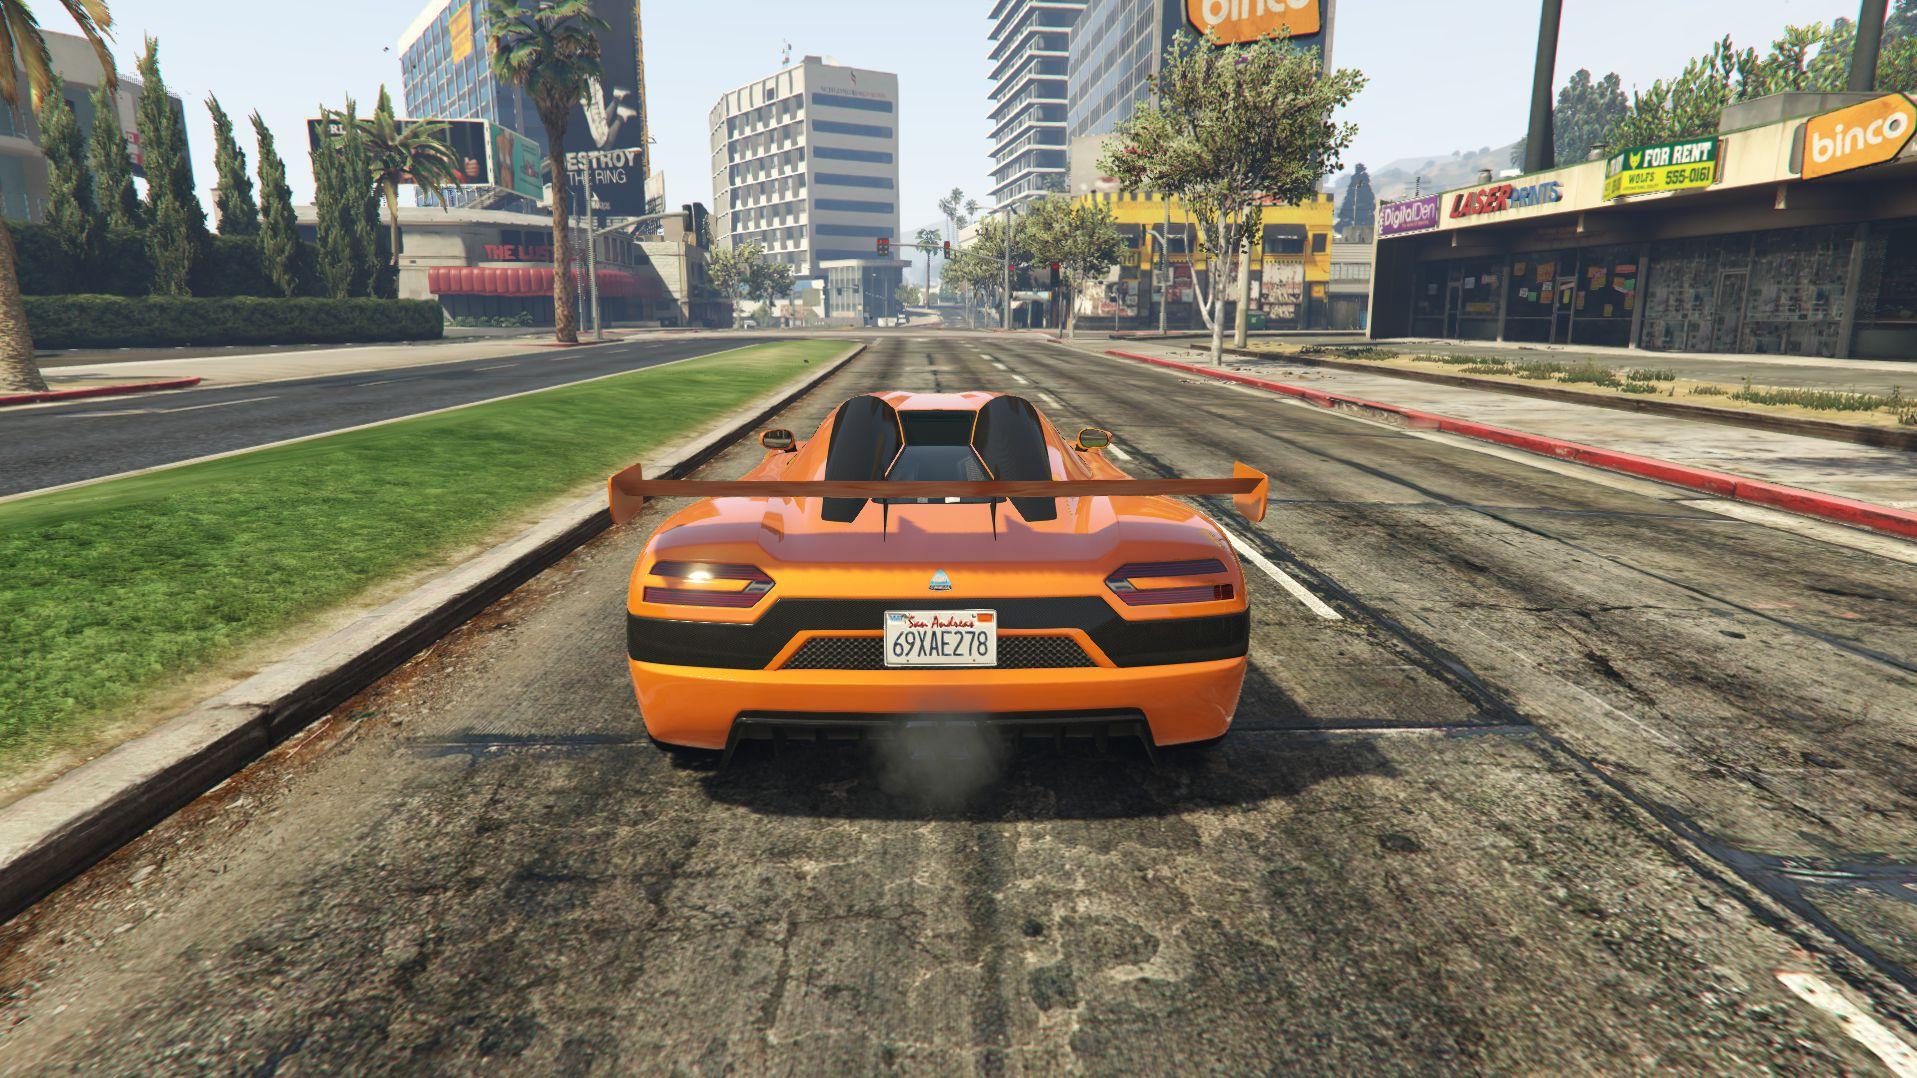 Supercars Gallery Fastest Car In Gta 5 Under 500k